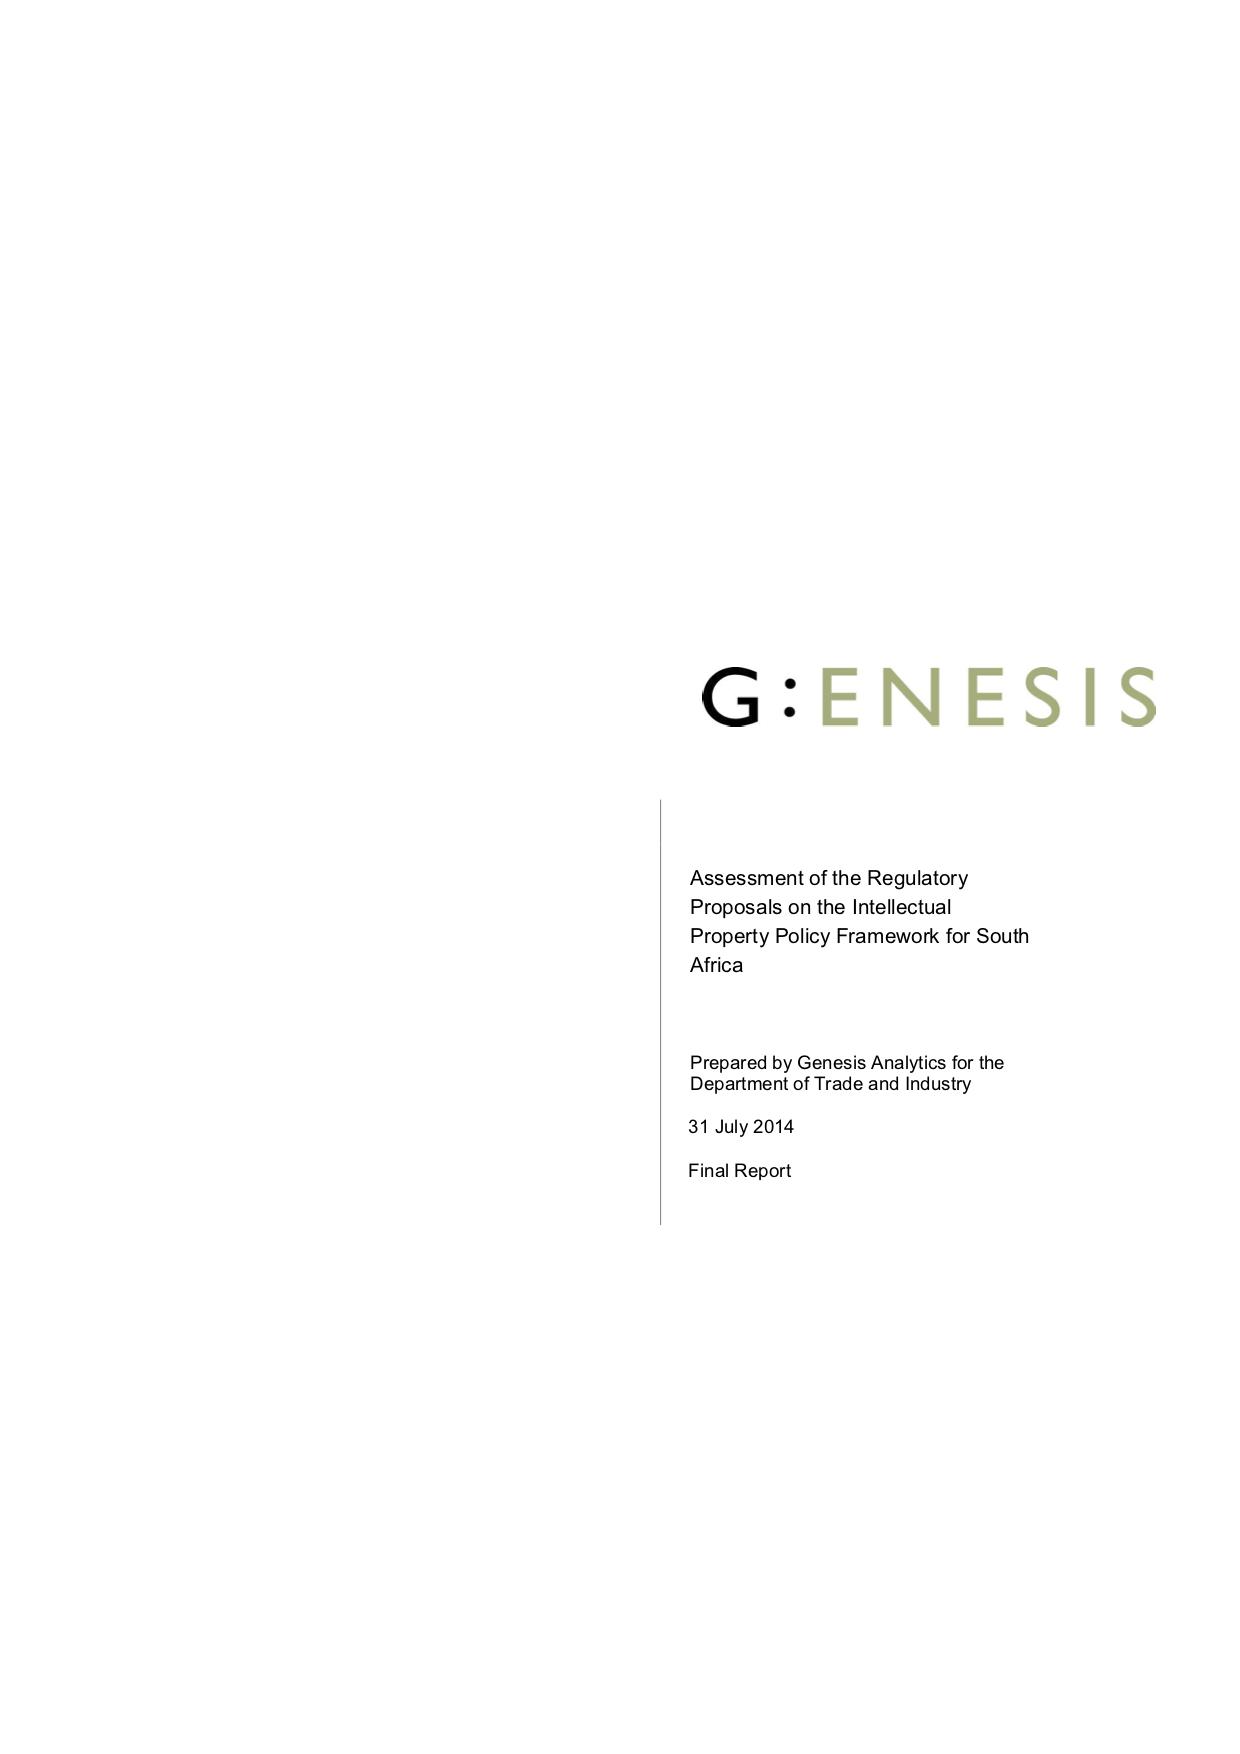 impact study DTI Genesis Study Image.png